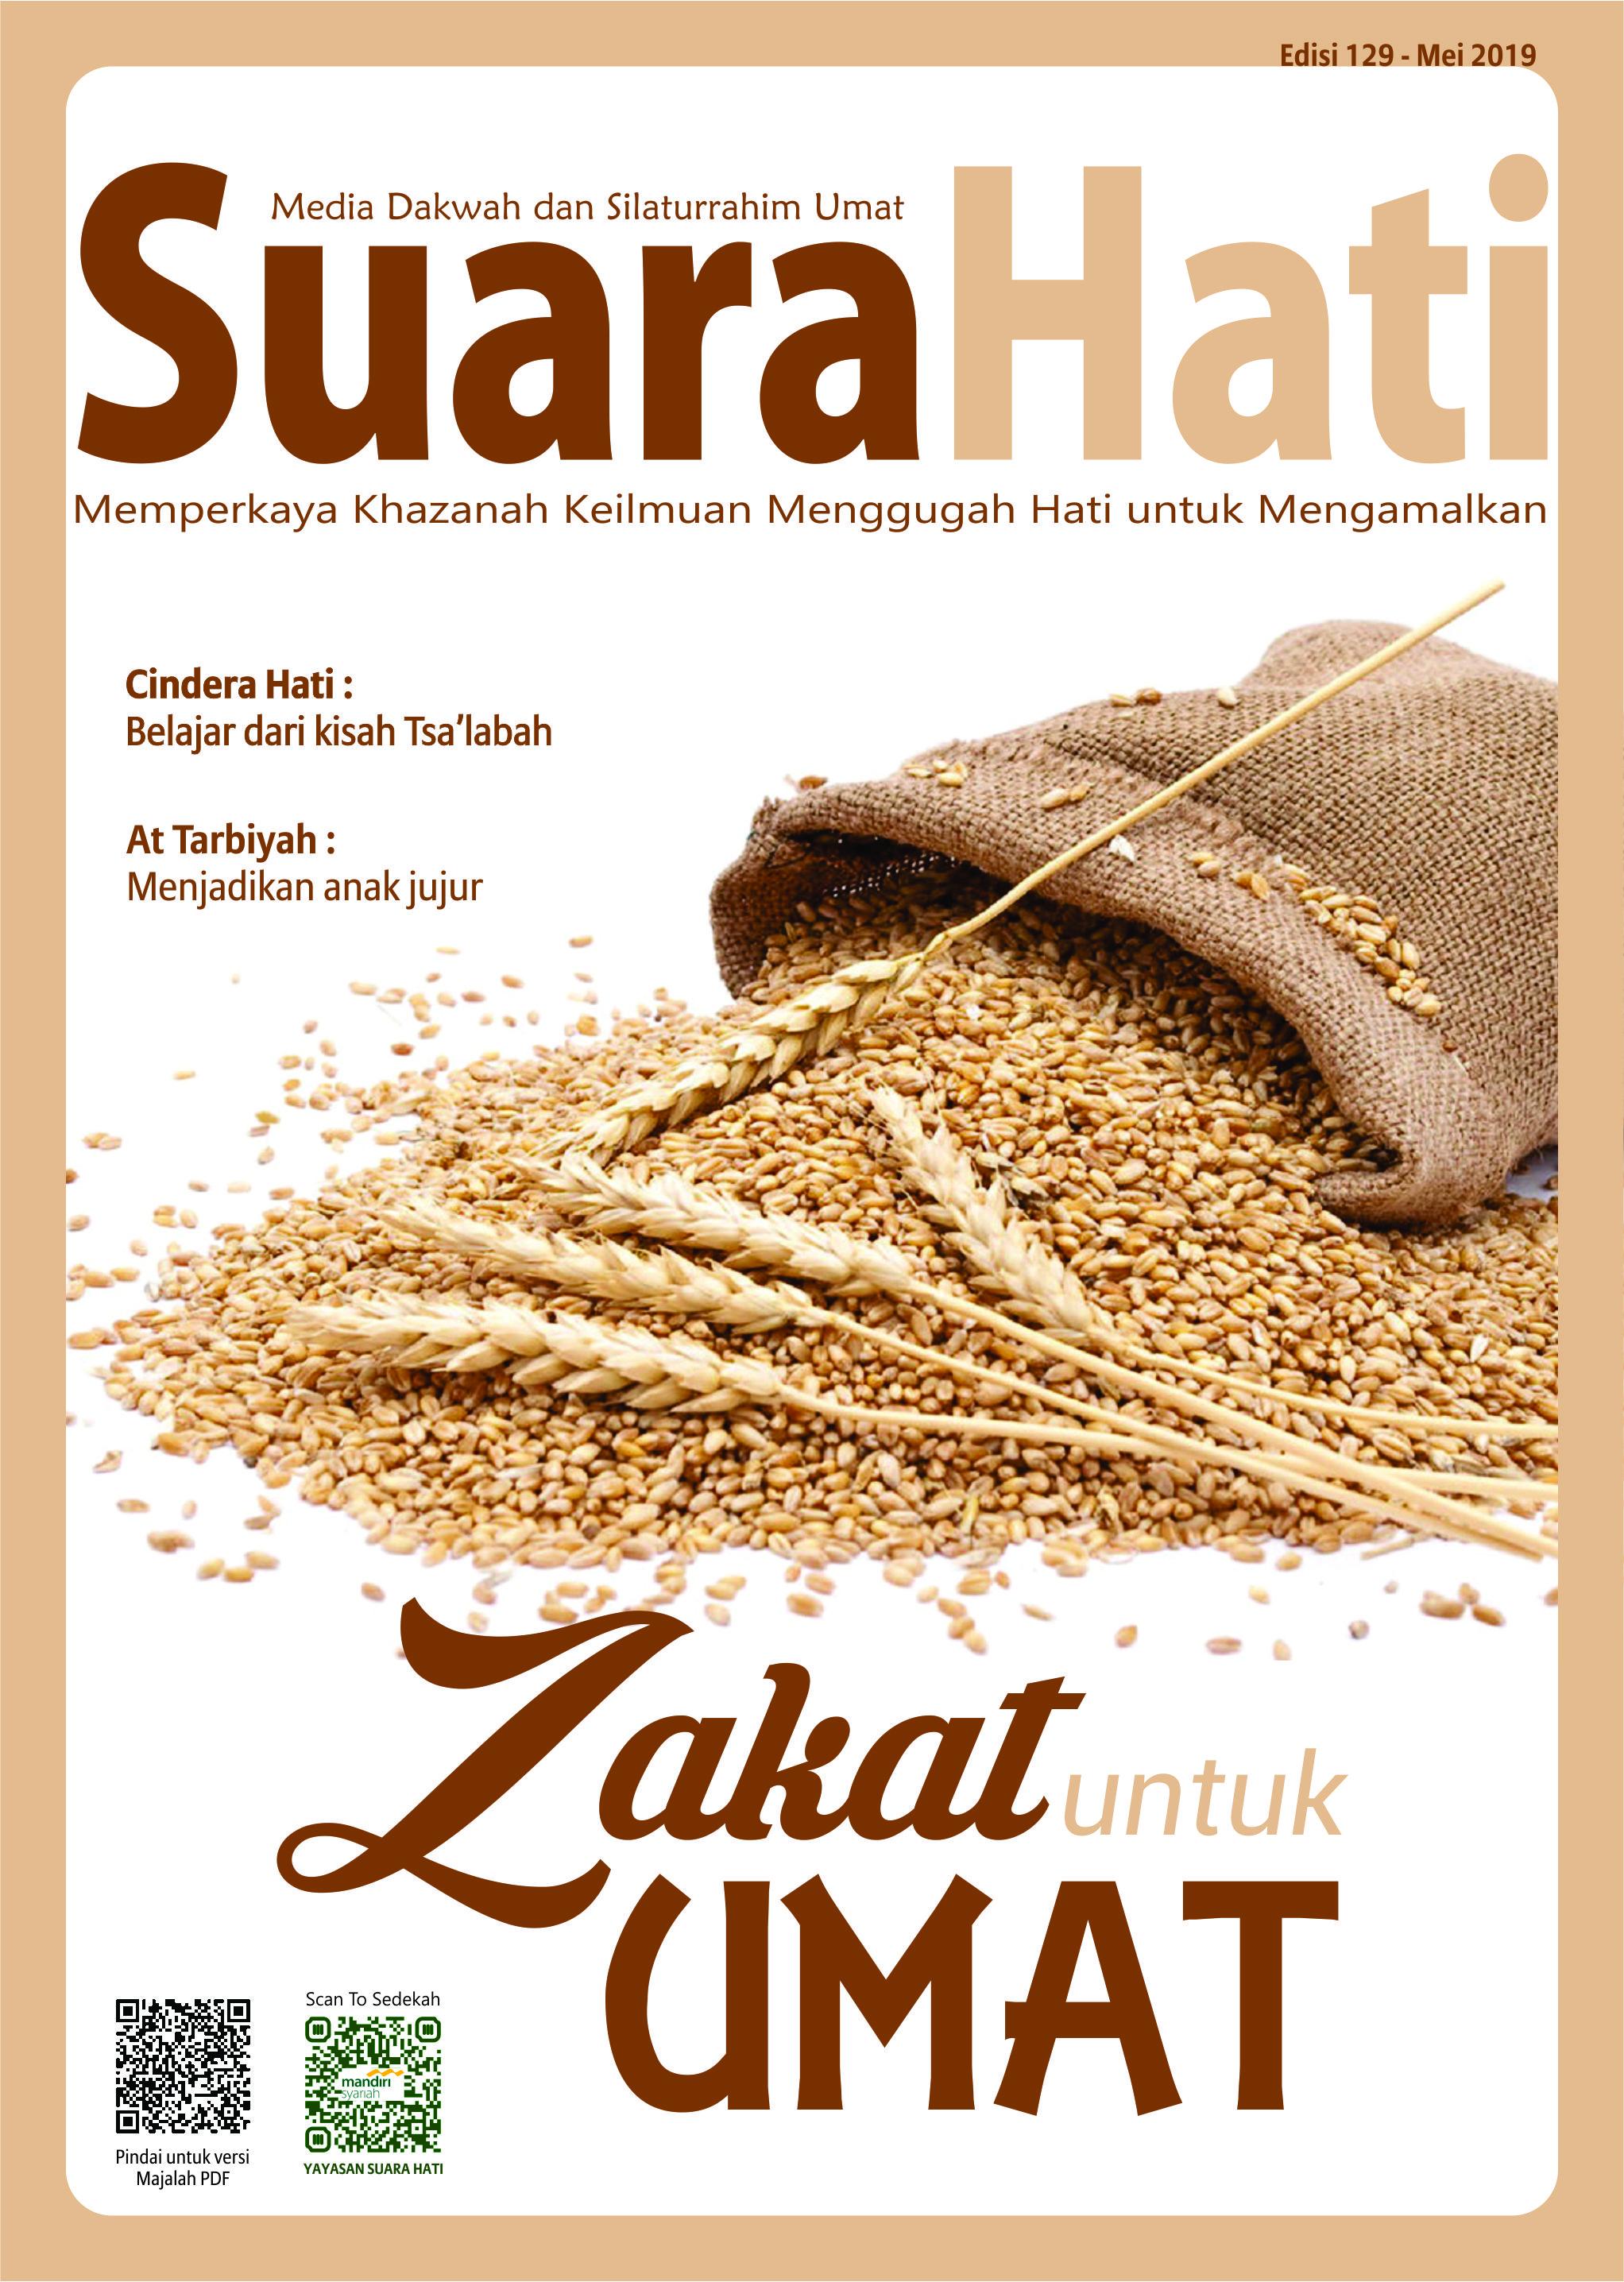 Majalah Suara Hati Edisi Mei 2019